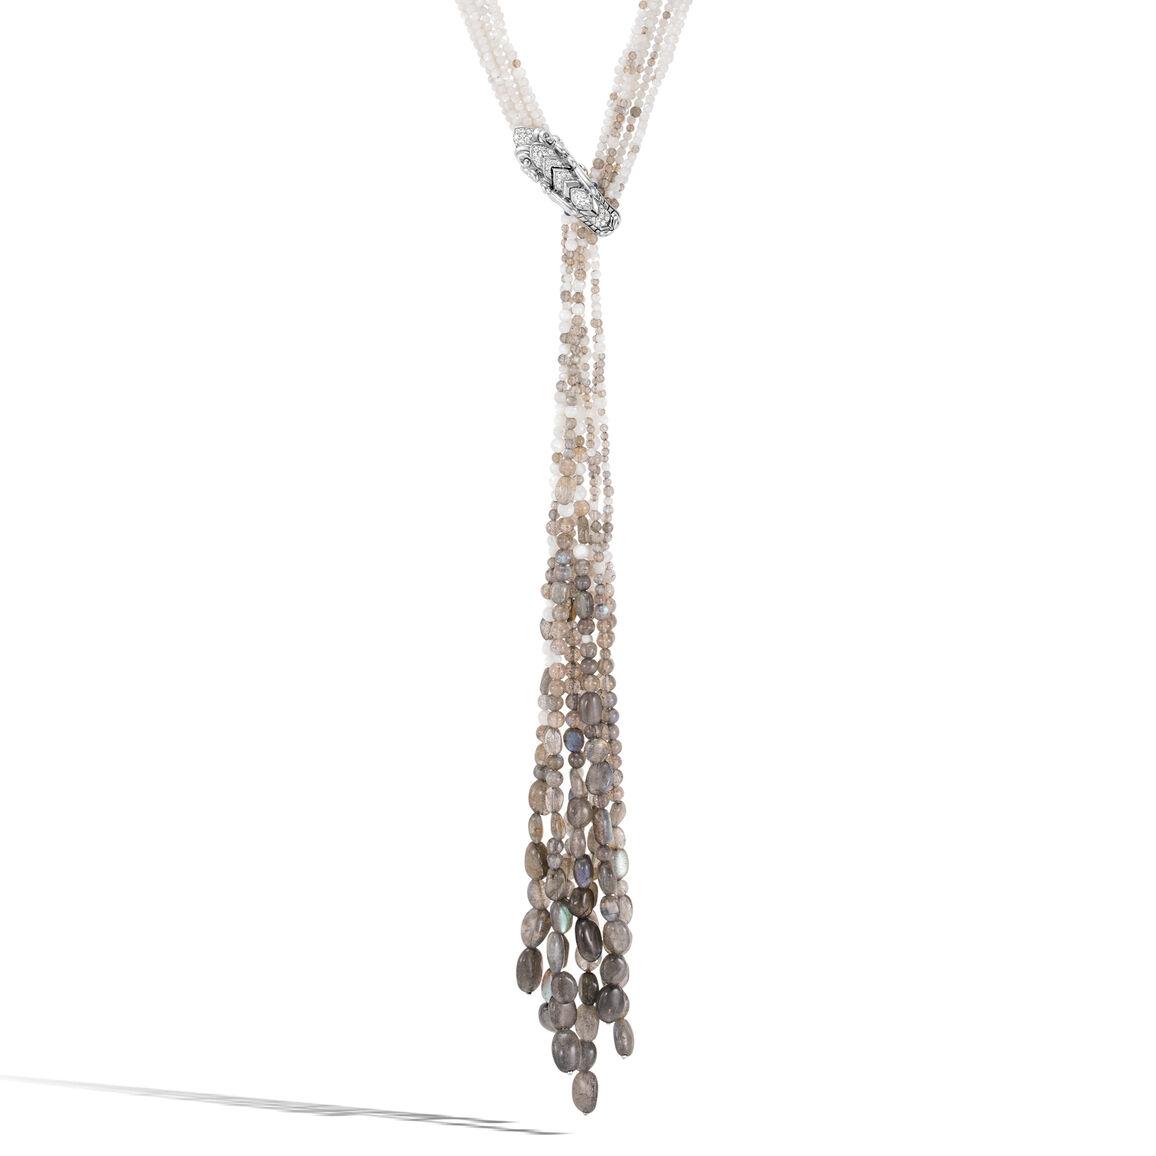 Legends Naga Lariat Necklace in Silver, Gemstone, Diamonds